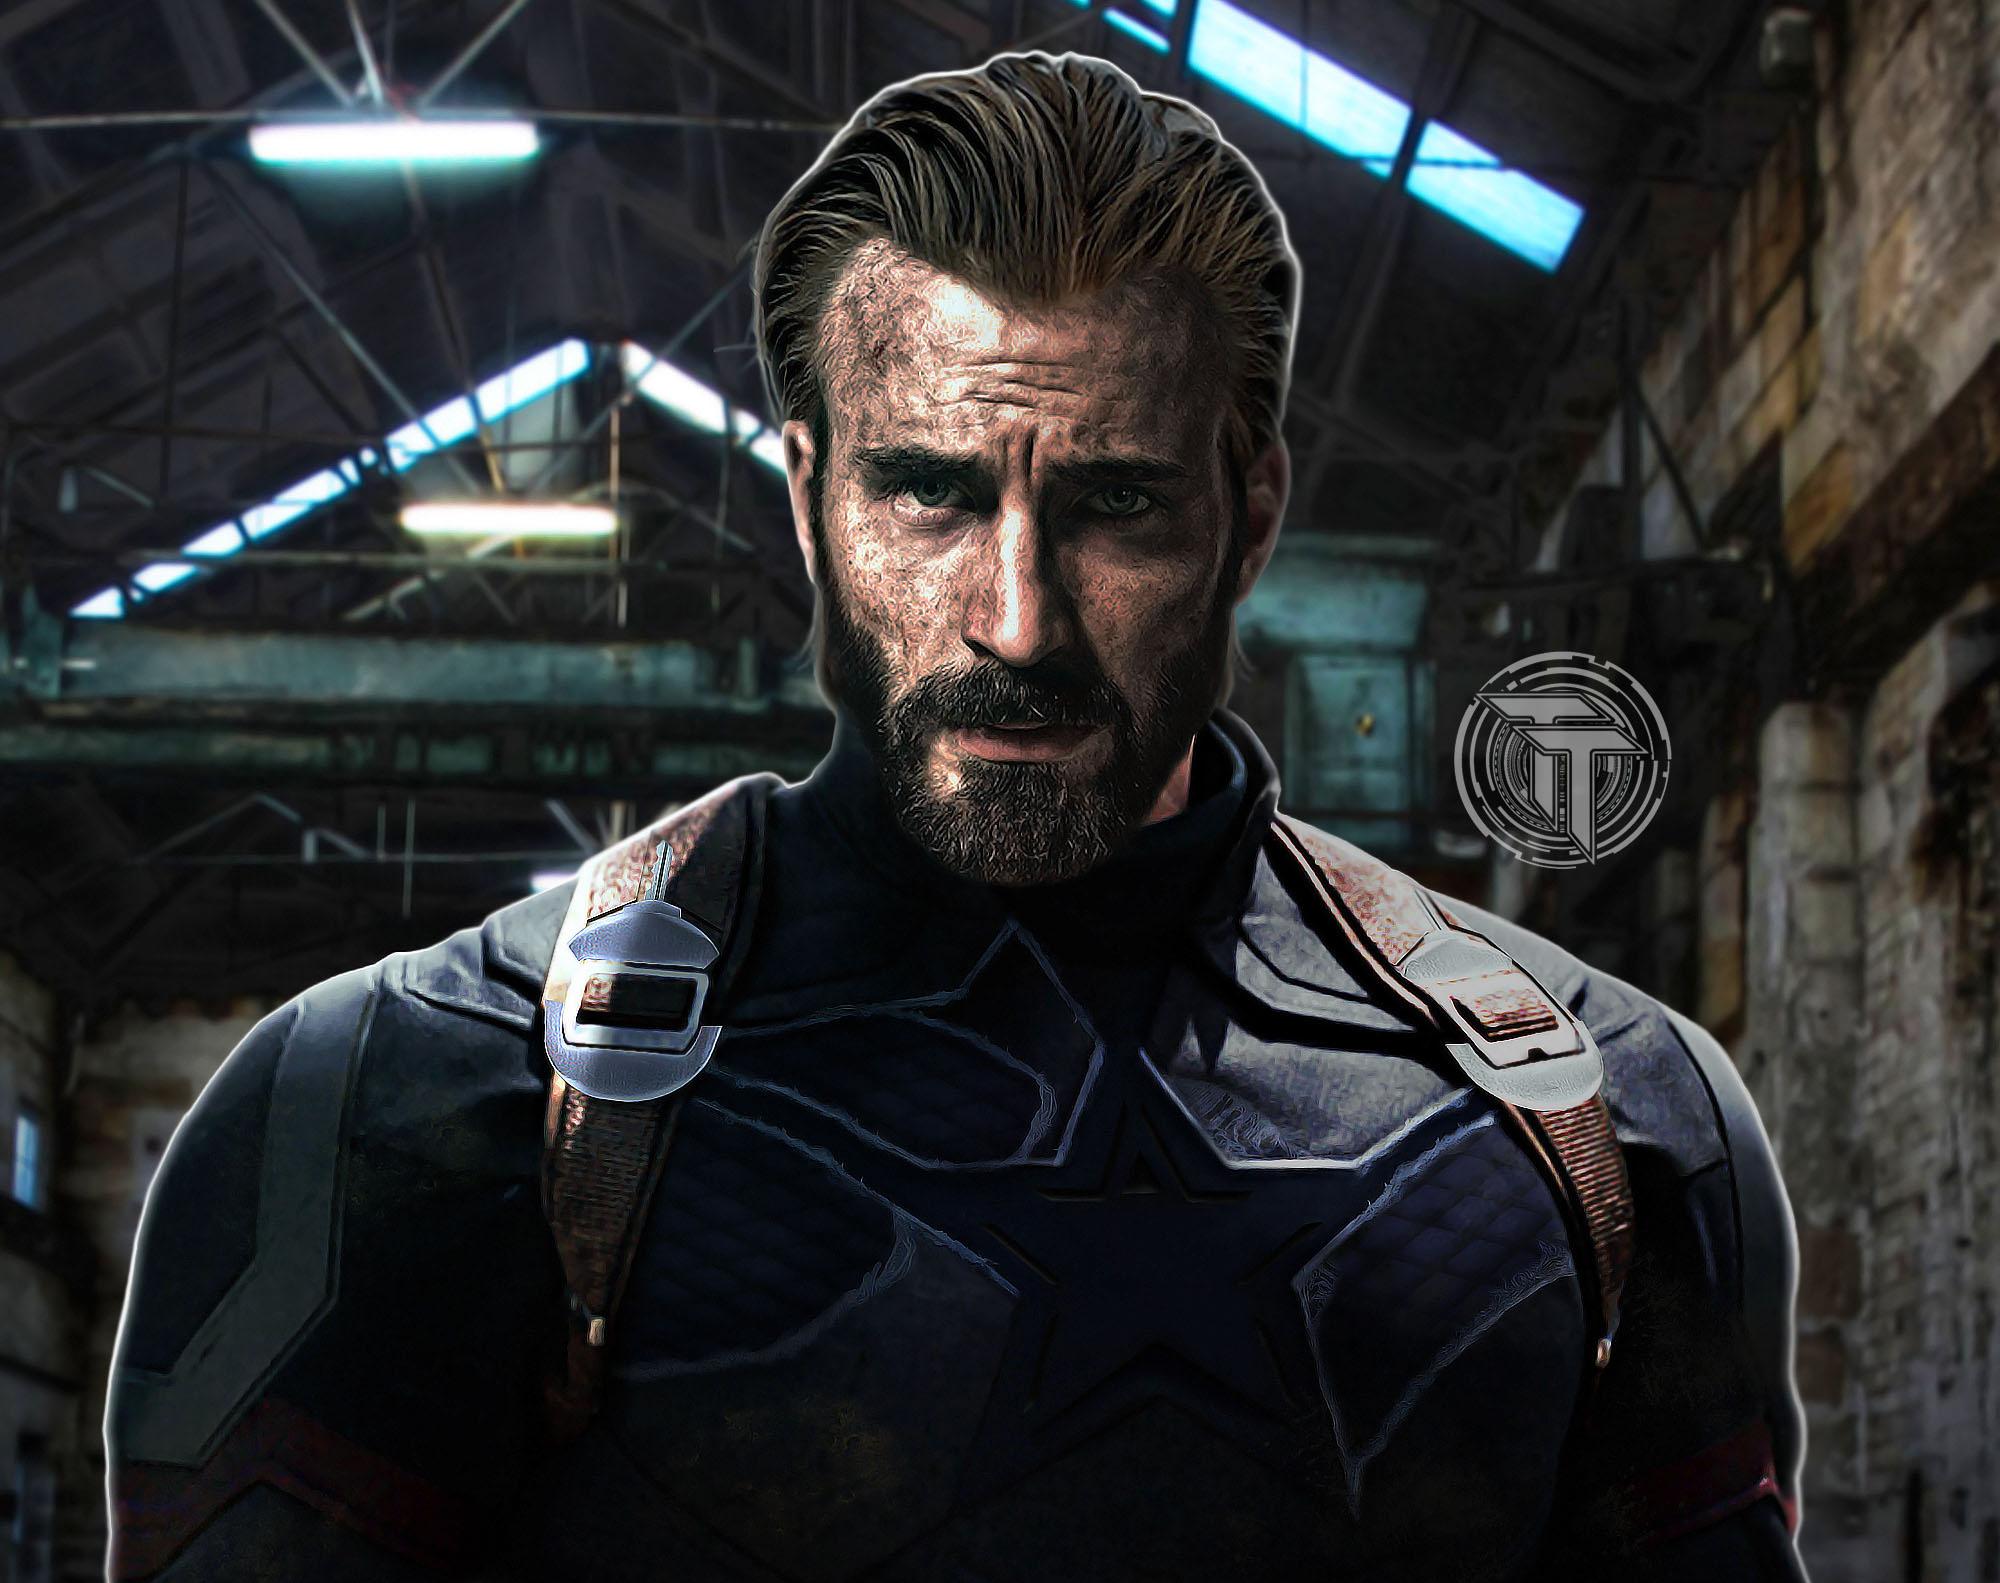 Captain America Beard Avengers Infinity War 2018 2748 Wallpapers 2000x1583